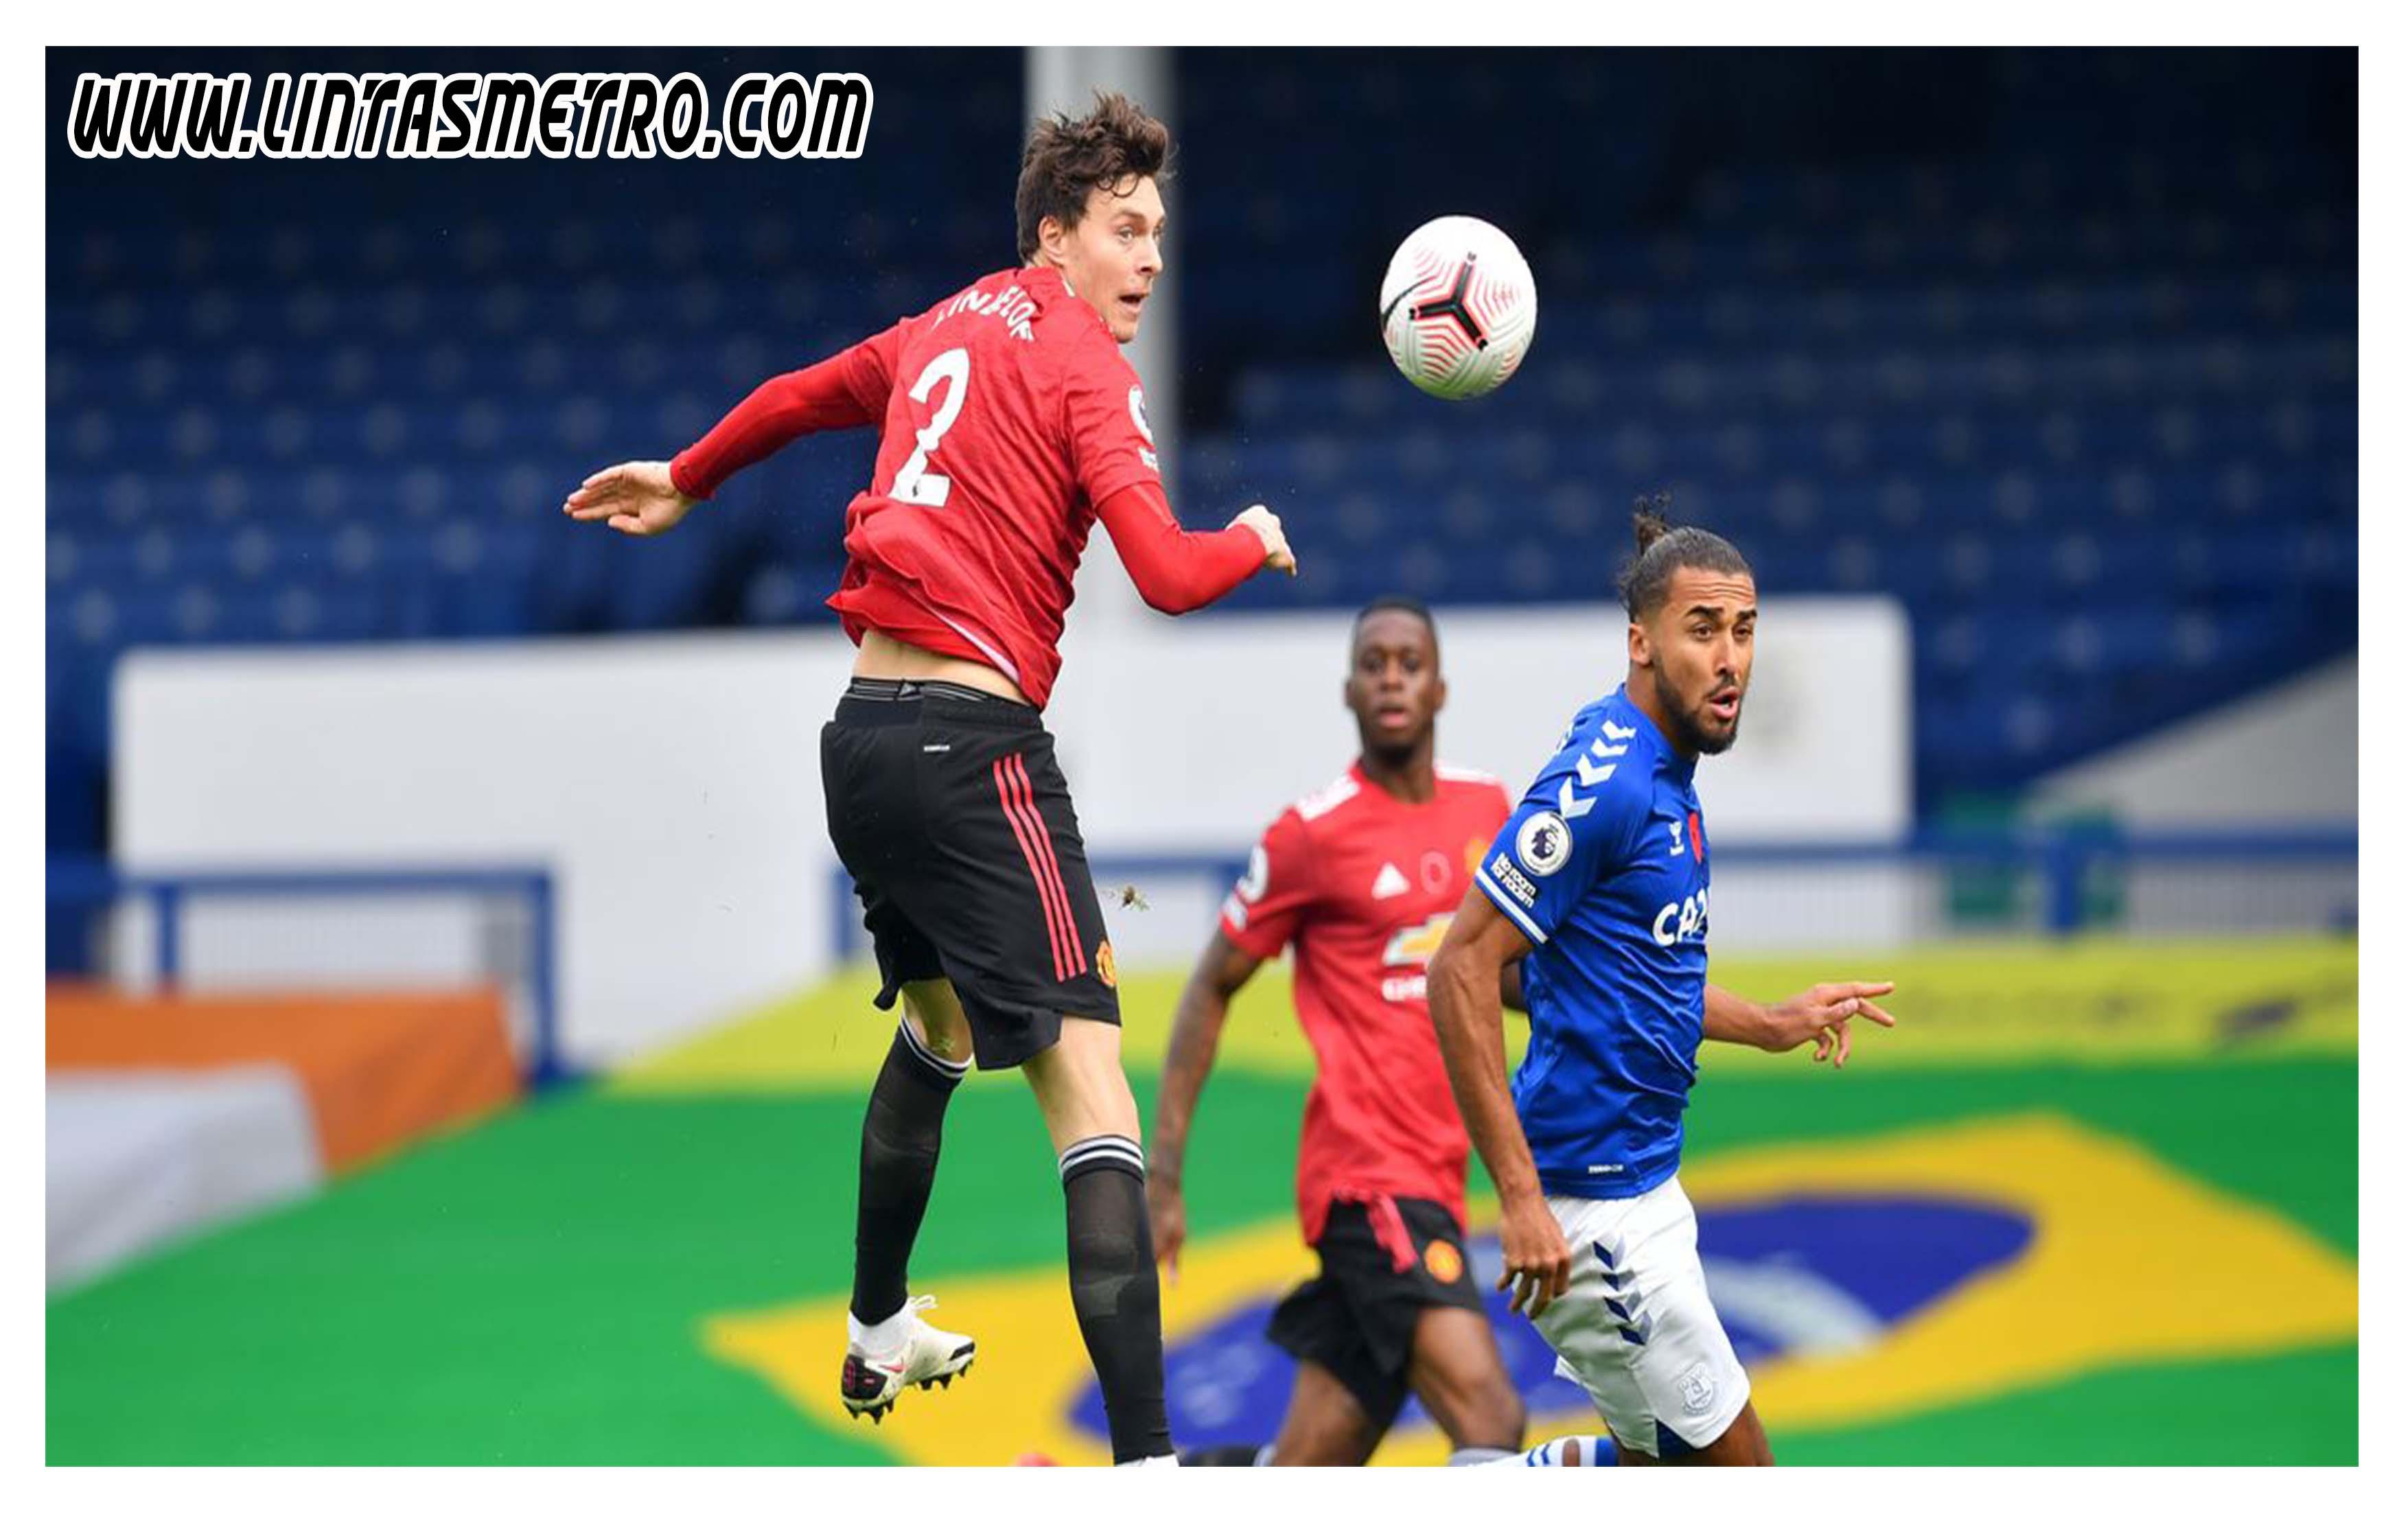 Everton vs Manchester United Prediksi Carabao Cup 2020/21